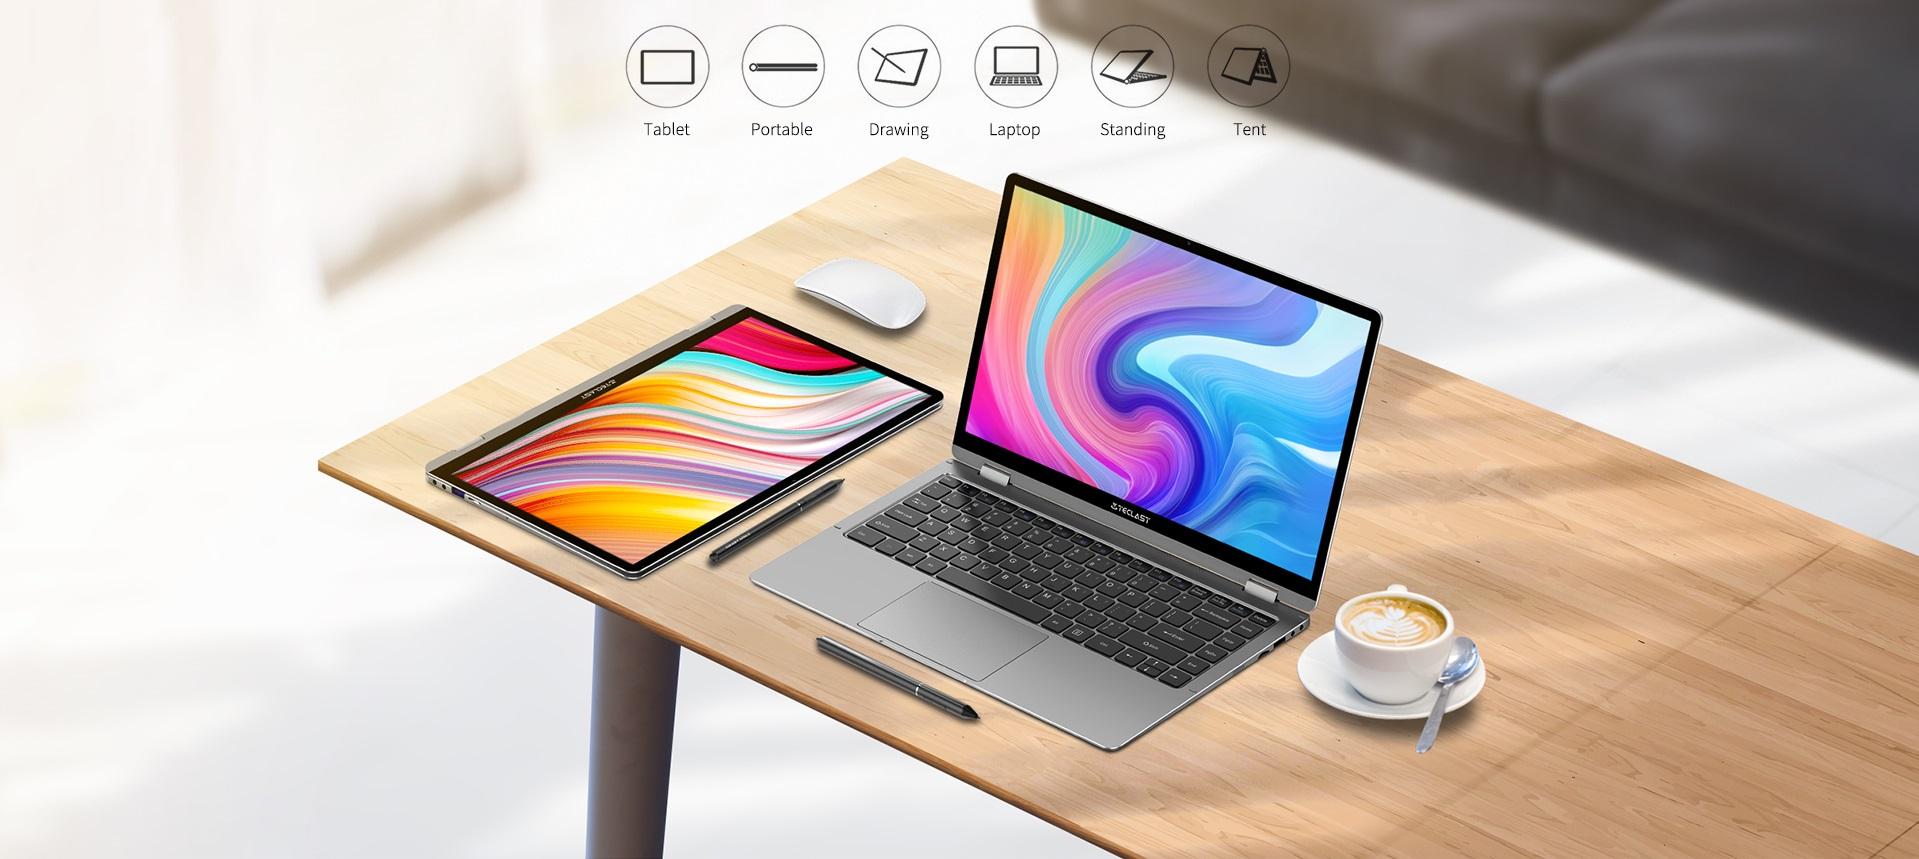 laptop konwertowalny Teclast F6 Plus